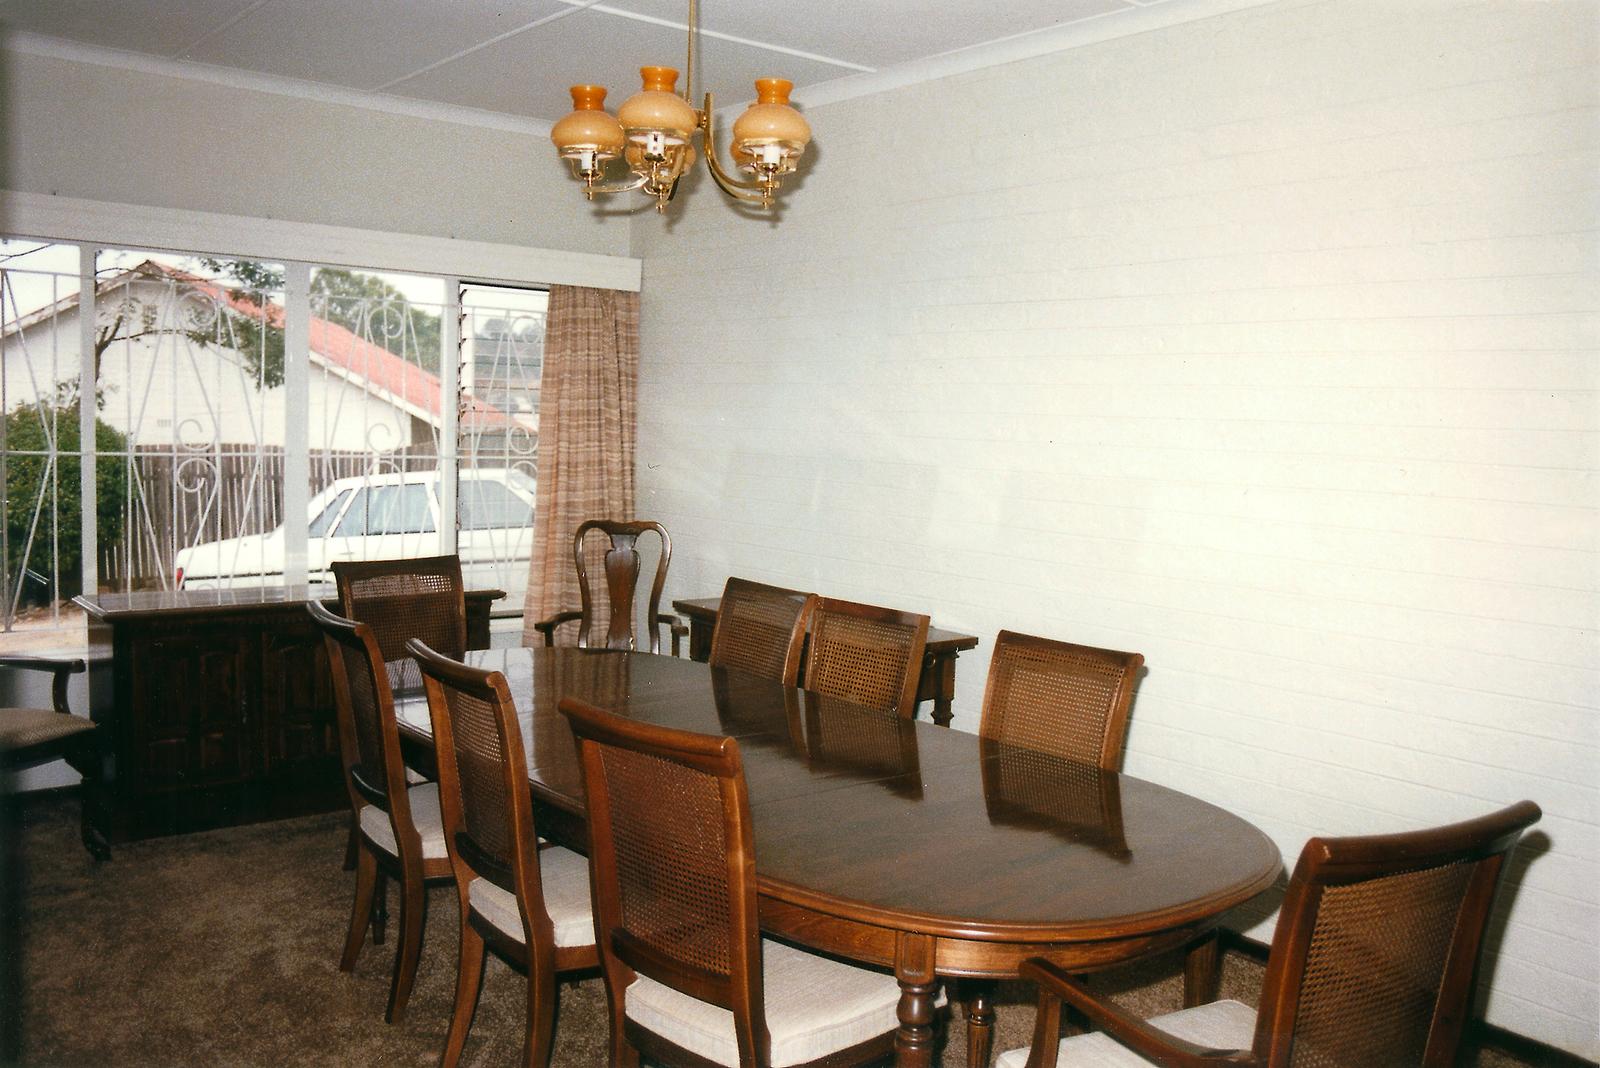 Mbabane - Standard Level Position Residence - 1988